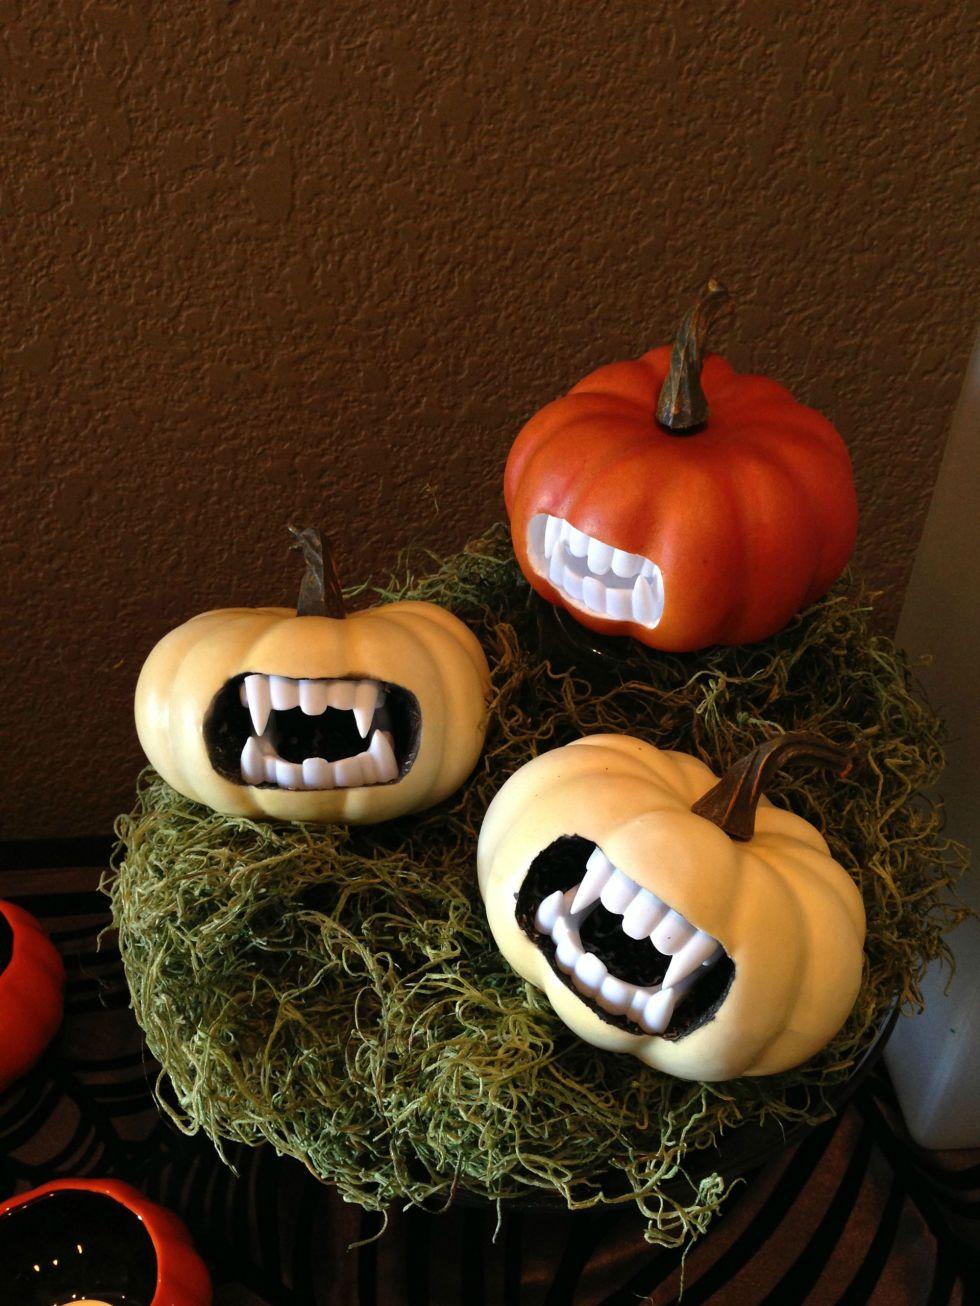 The 32 Best Pumpkin Decorating Ideas You Ve Ever Seen Pumpkin Decorating Halloween Pumpkin Diy Halloween Diy Crafts